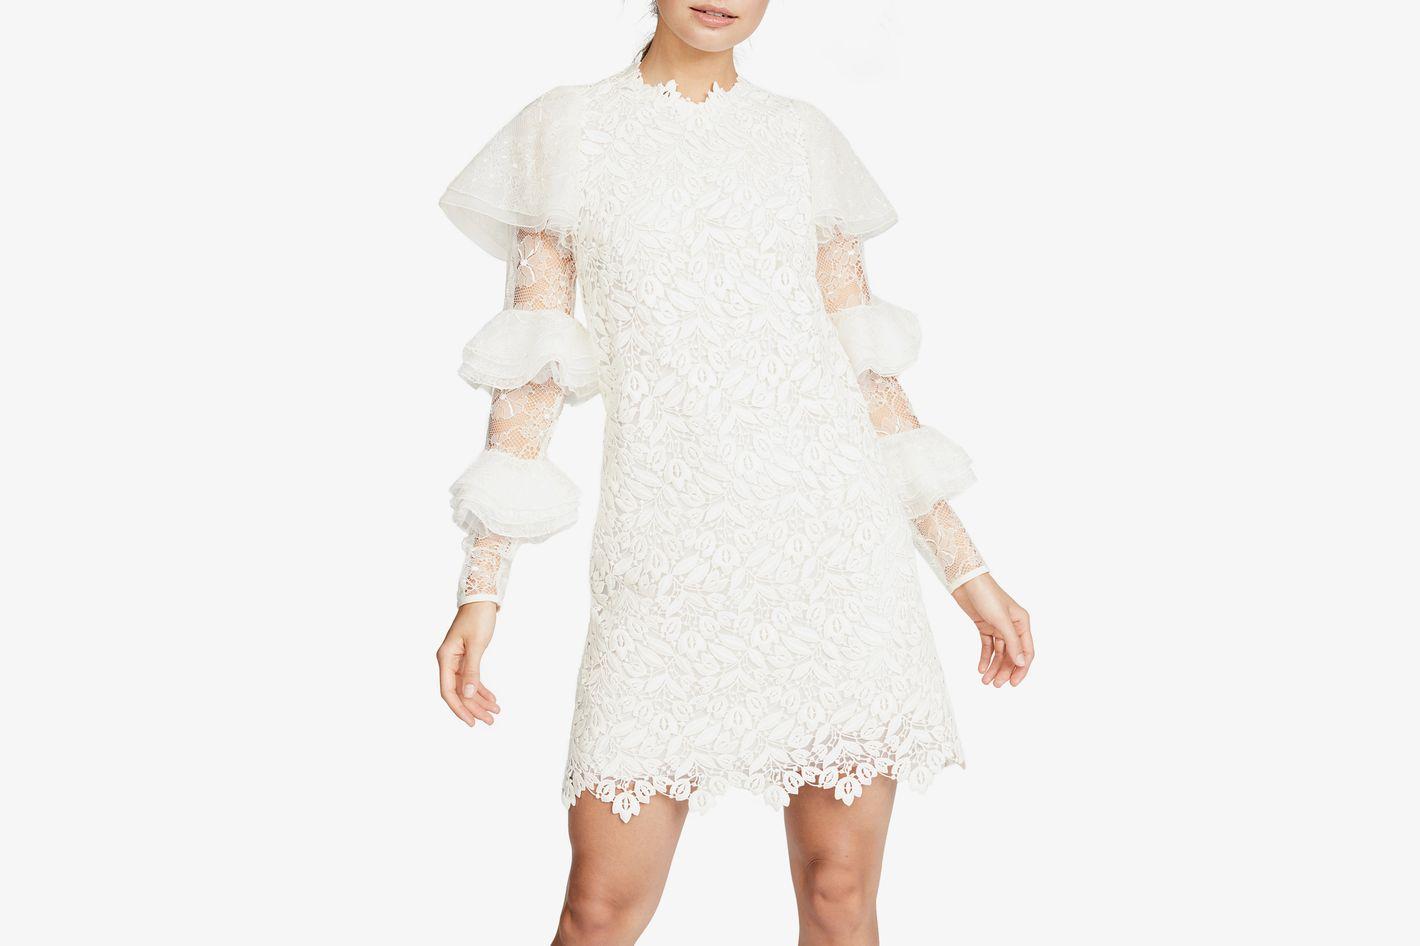 Giambattista Valli Riffle Sleeve Lace Dress